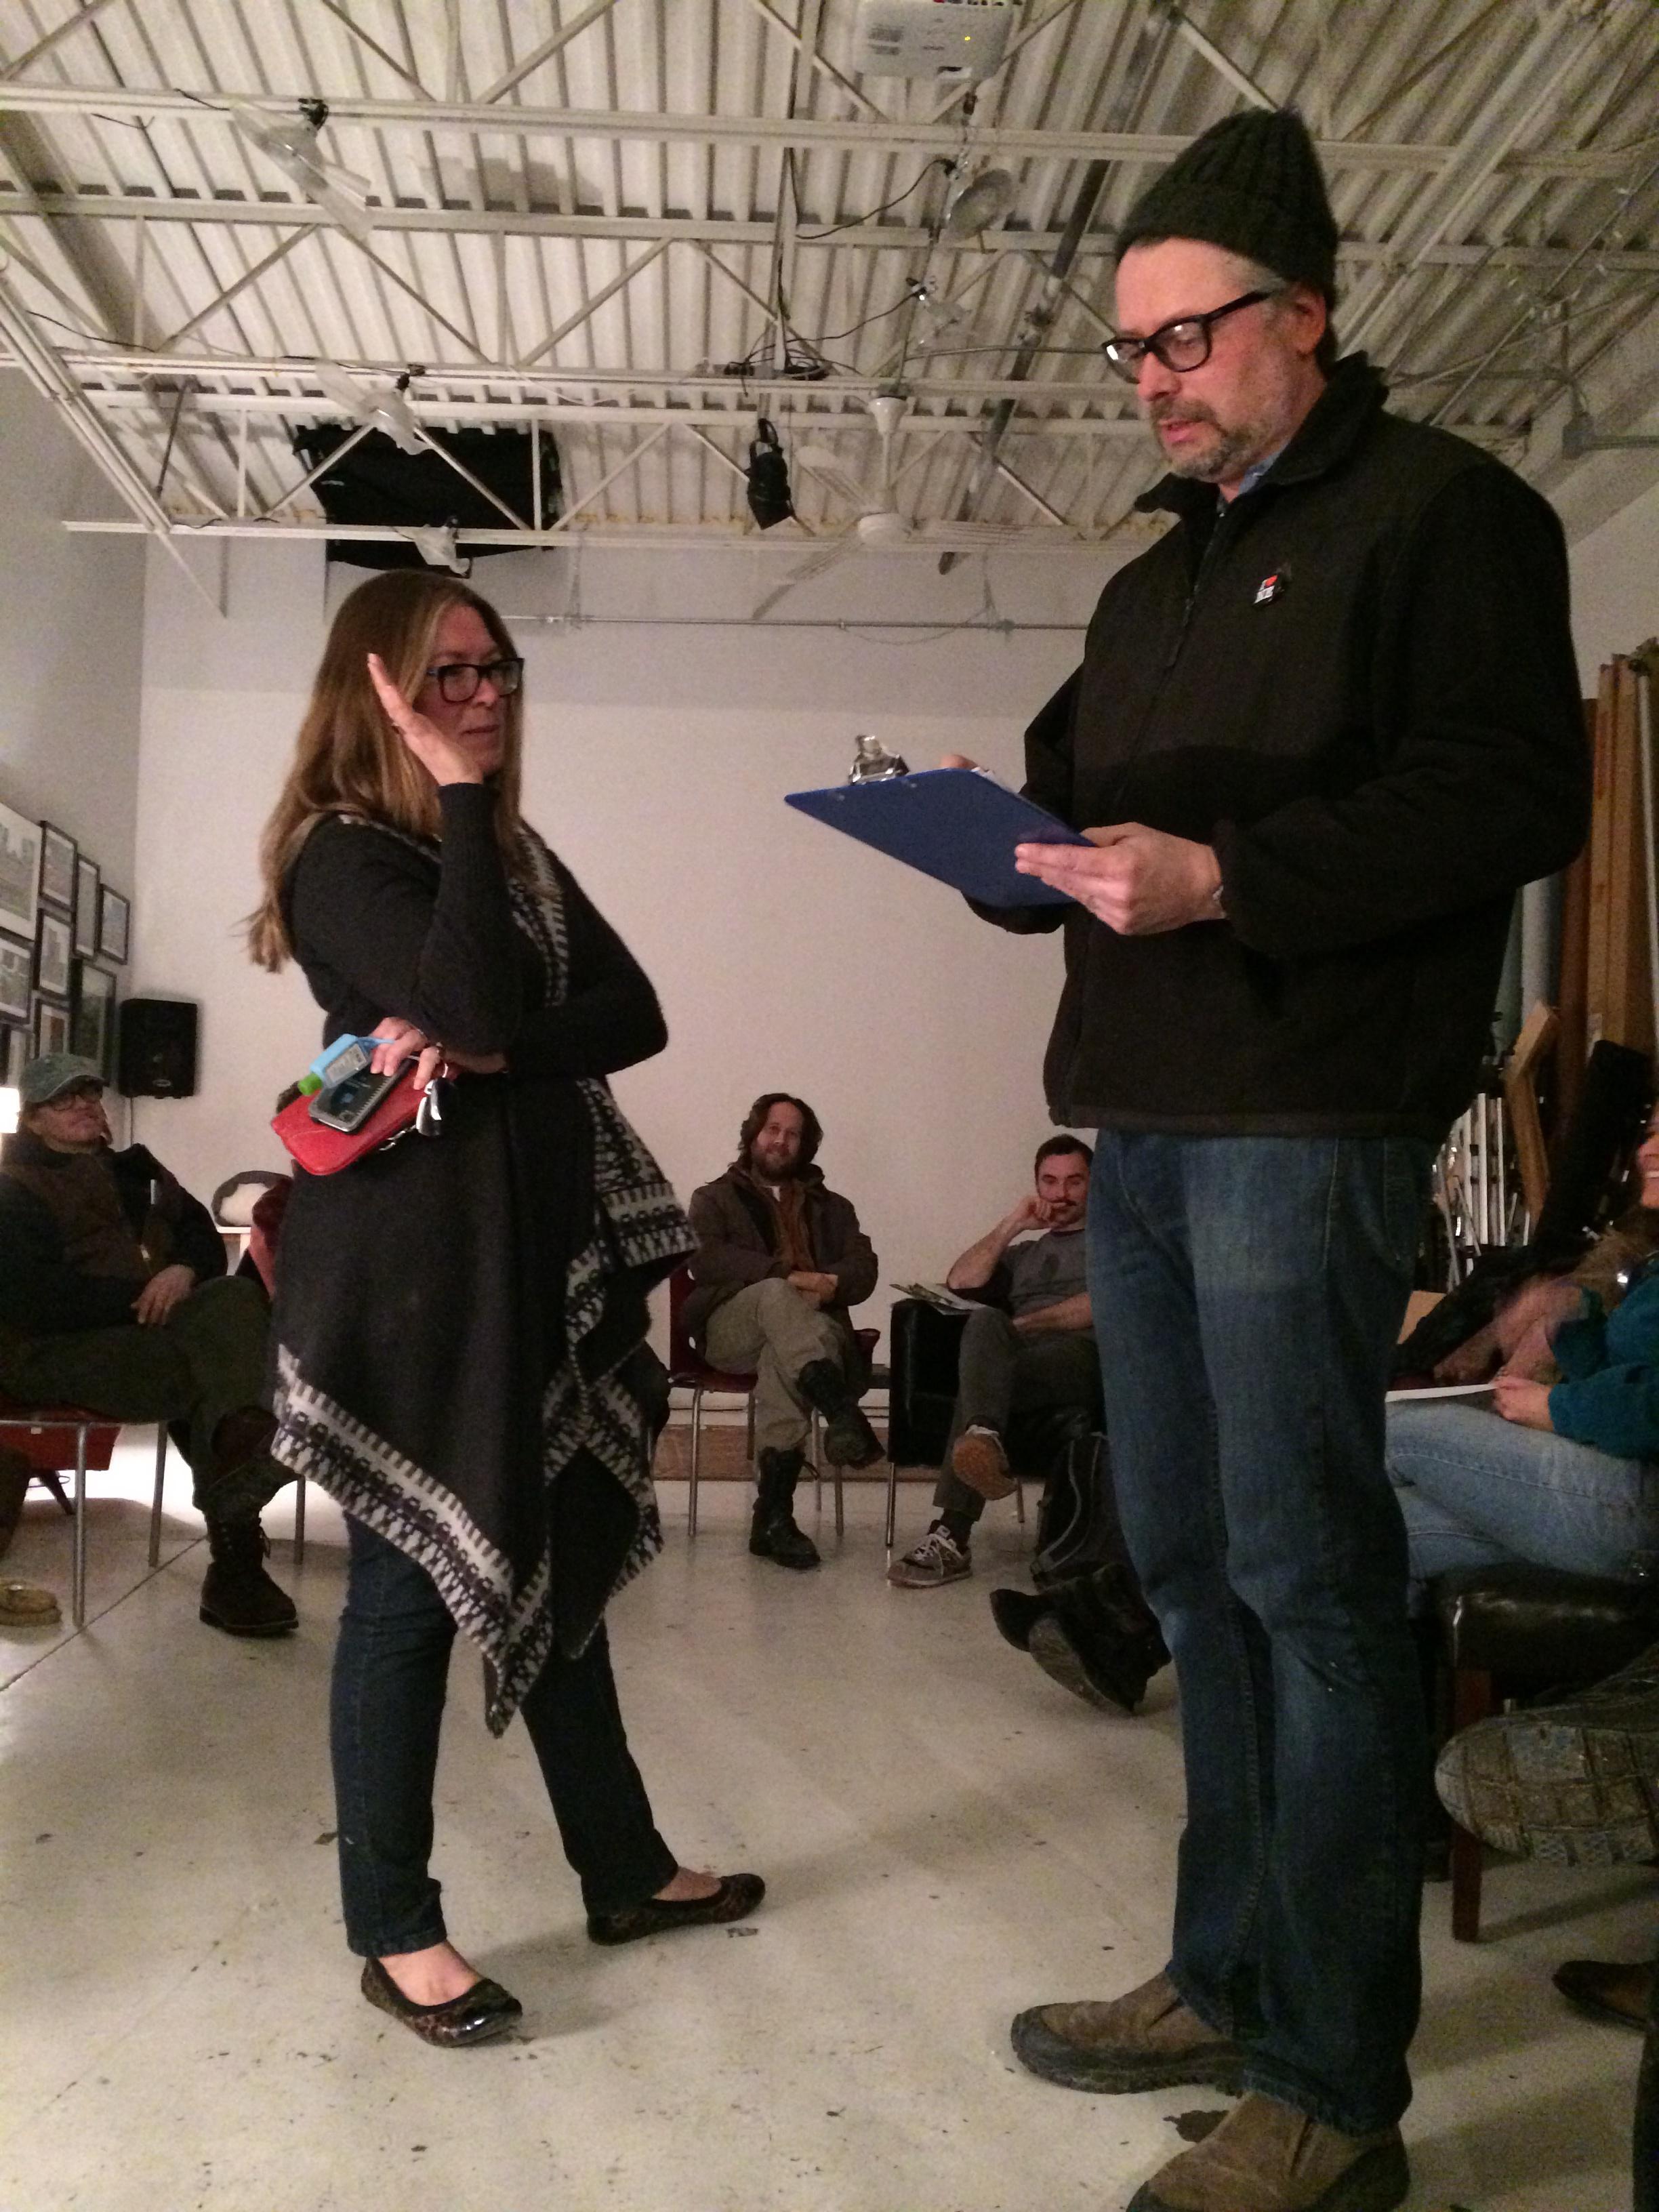 Brenda Torre reciting the IA pledge, photo by Deanna Johnson.